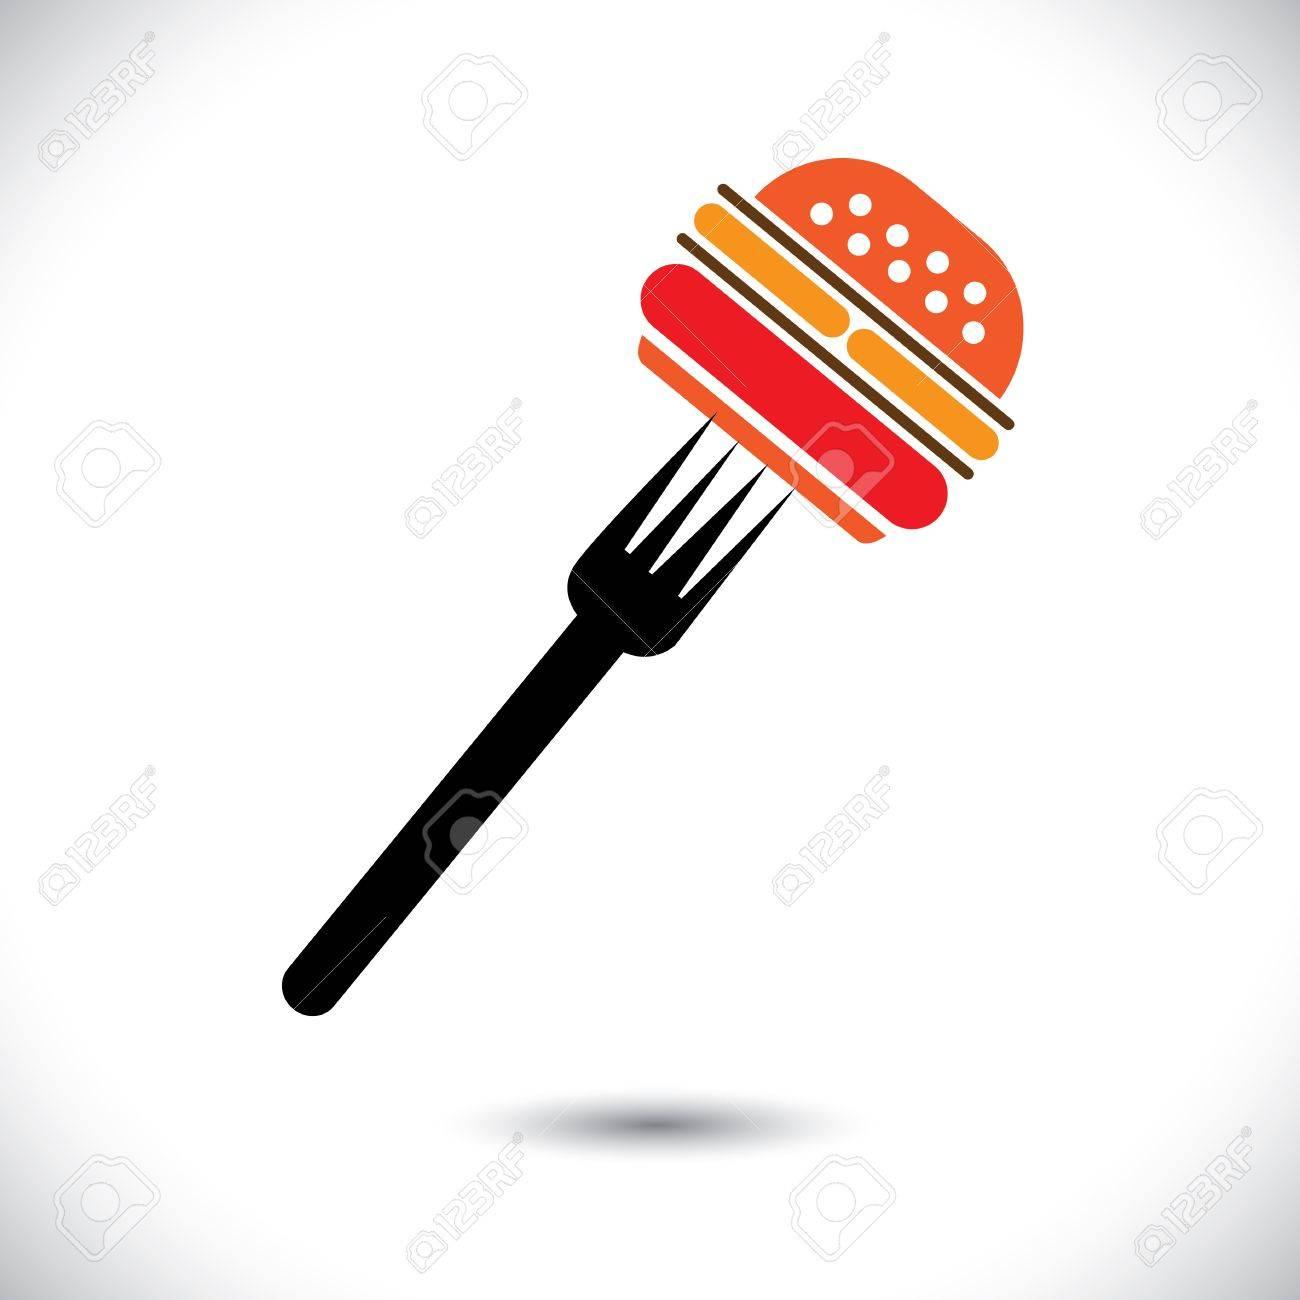 burger & fork illustration Stock Vector - 19688220